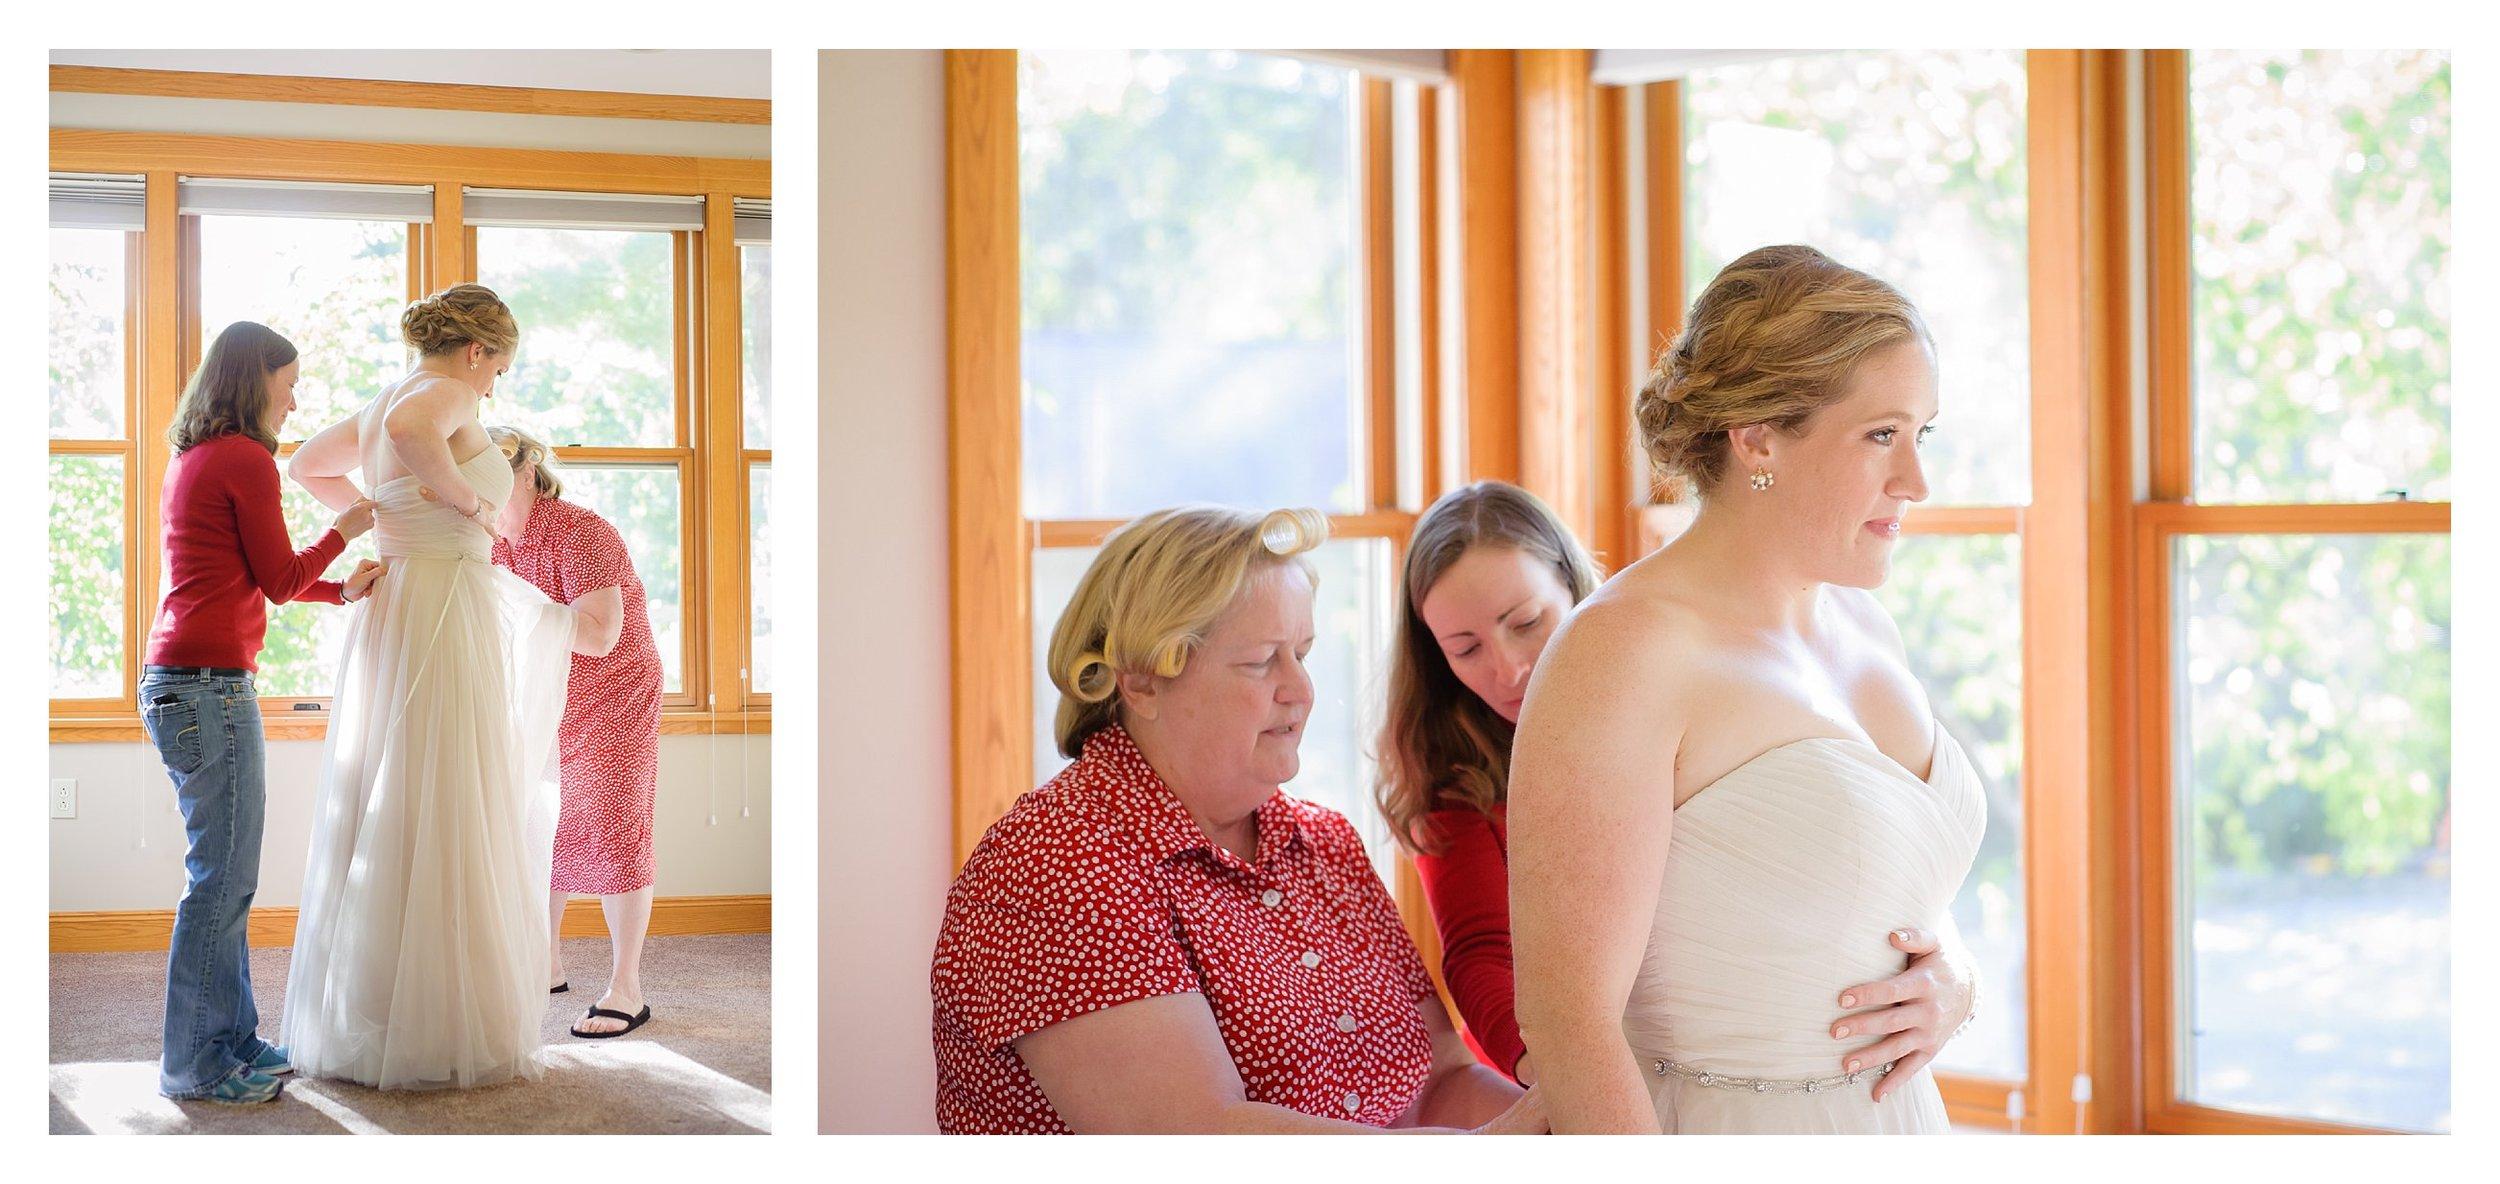 Lindstrom MN Twin cities Minnesota northwoods Bayfield wisconsin destination wedding ps 139 photography_0462.jpg